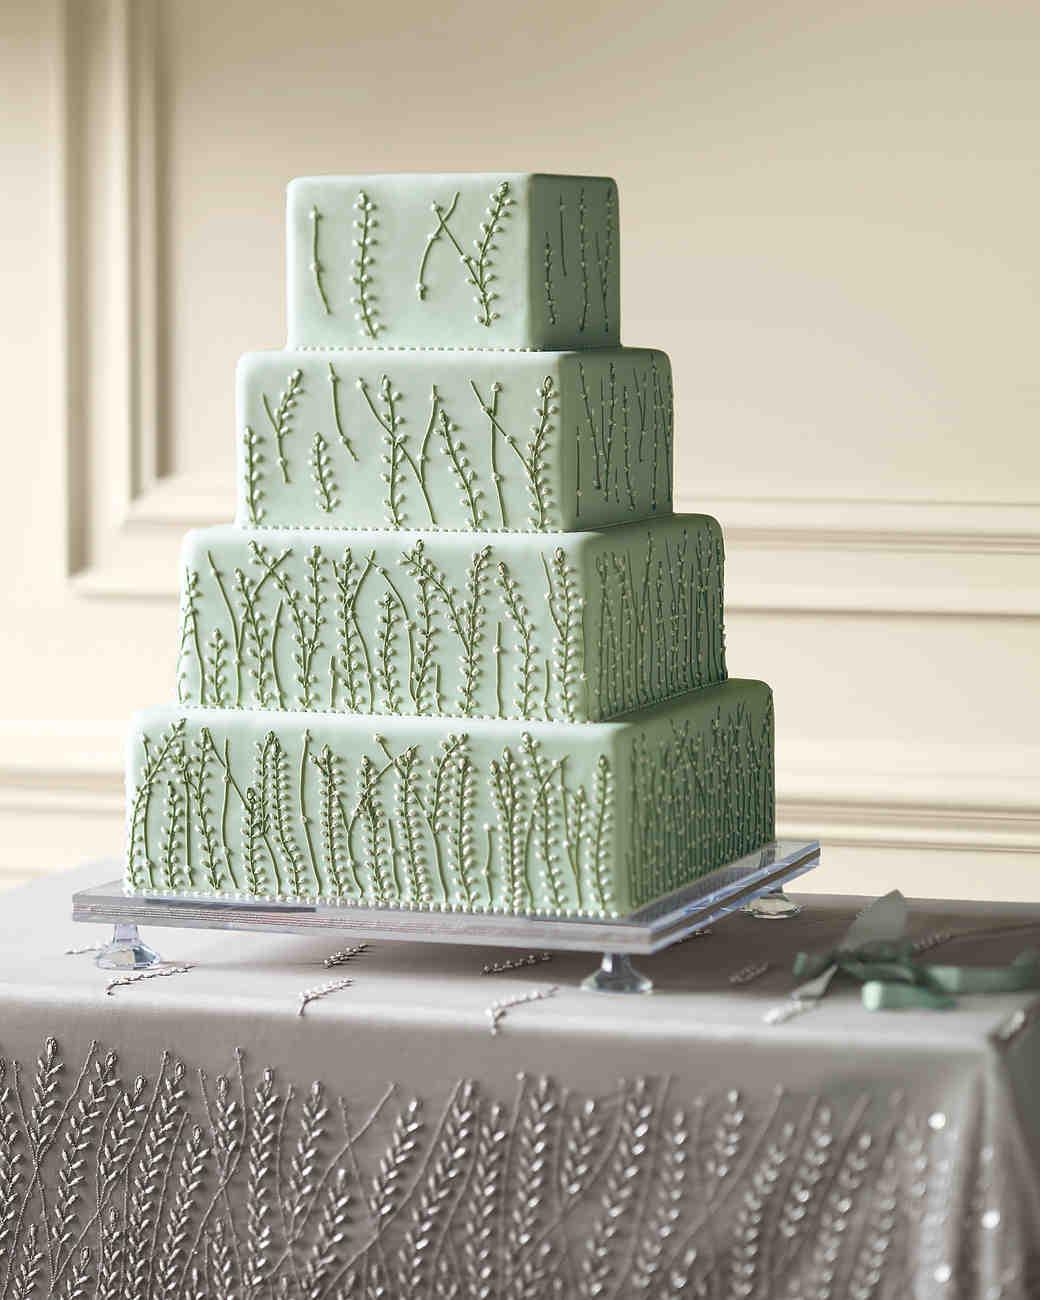 cake-3-0811mwd107413.jpg